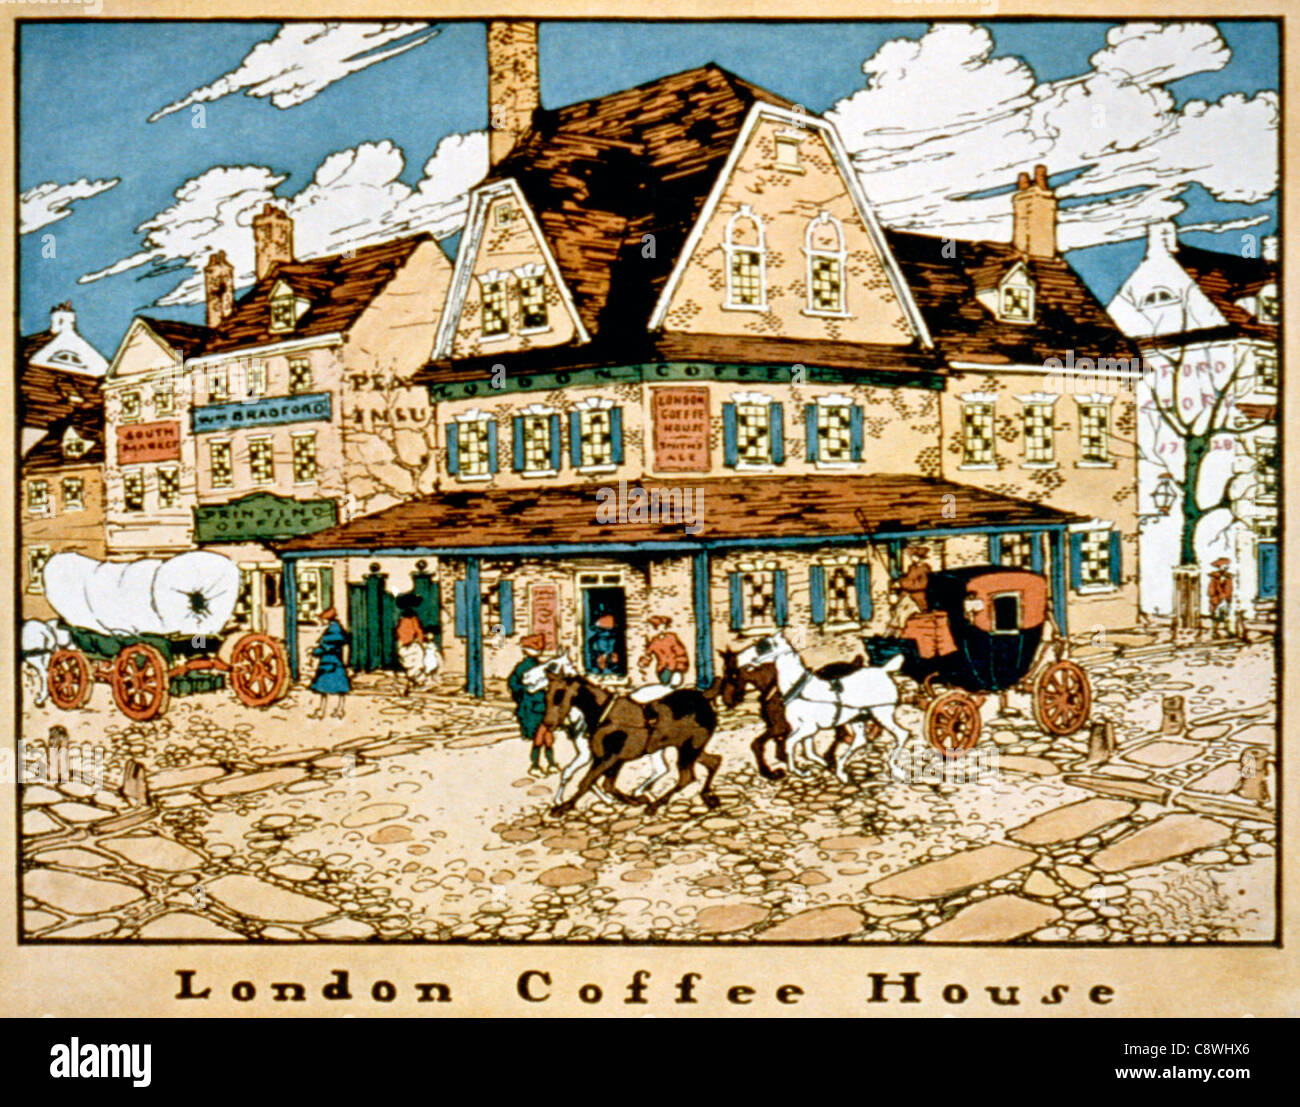 London Coffee House - Pre-Revolutionary taverns and inns in Philadelphia, Pennsylvania - Stock Image